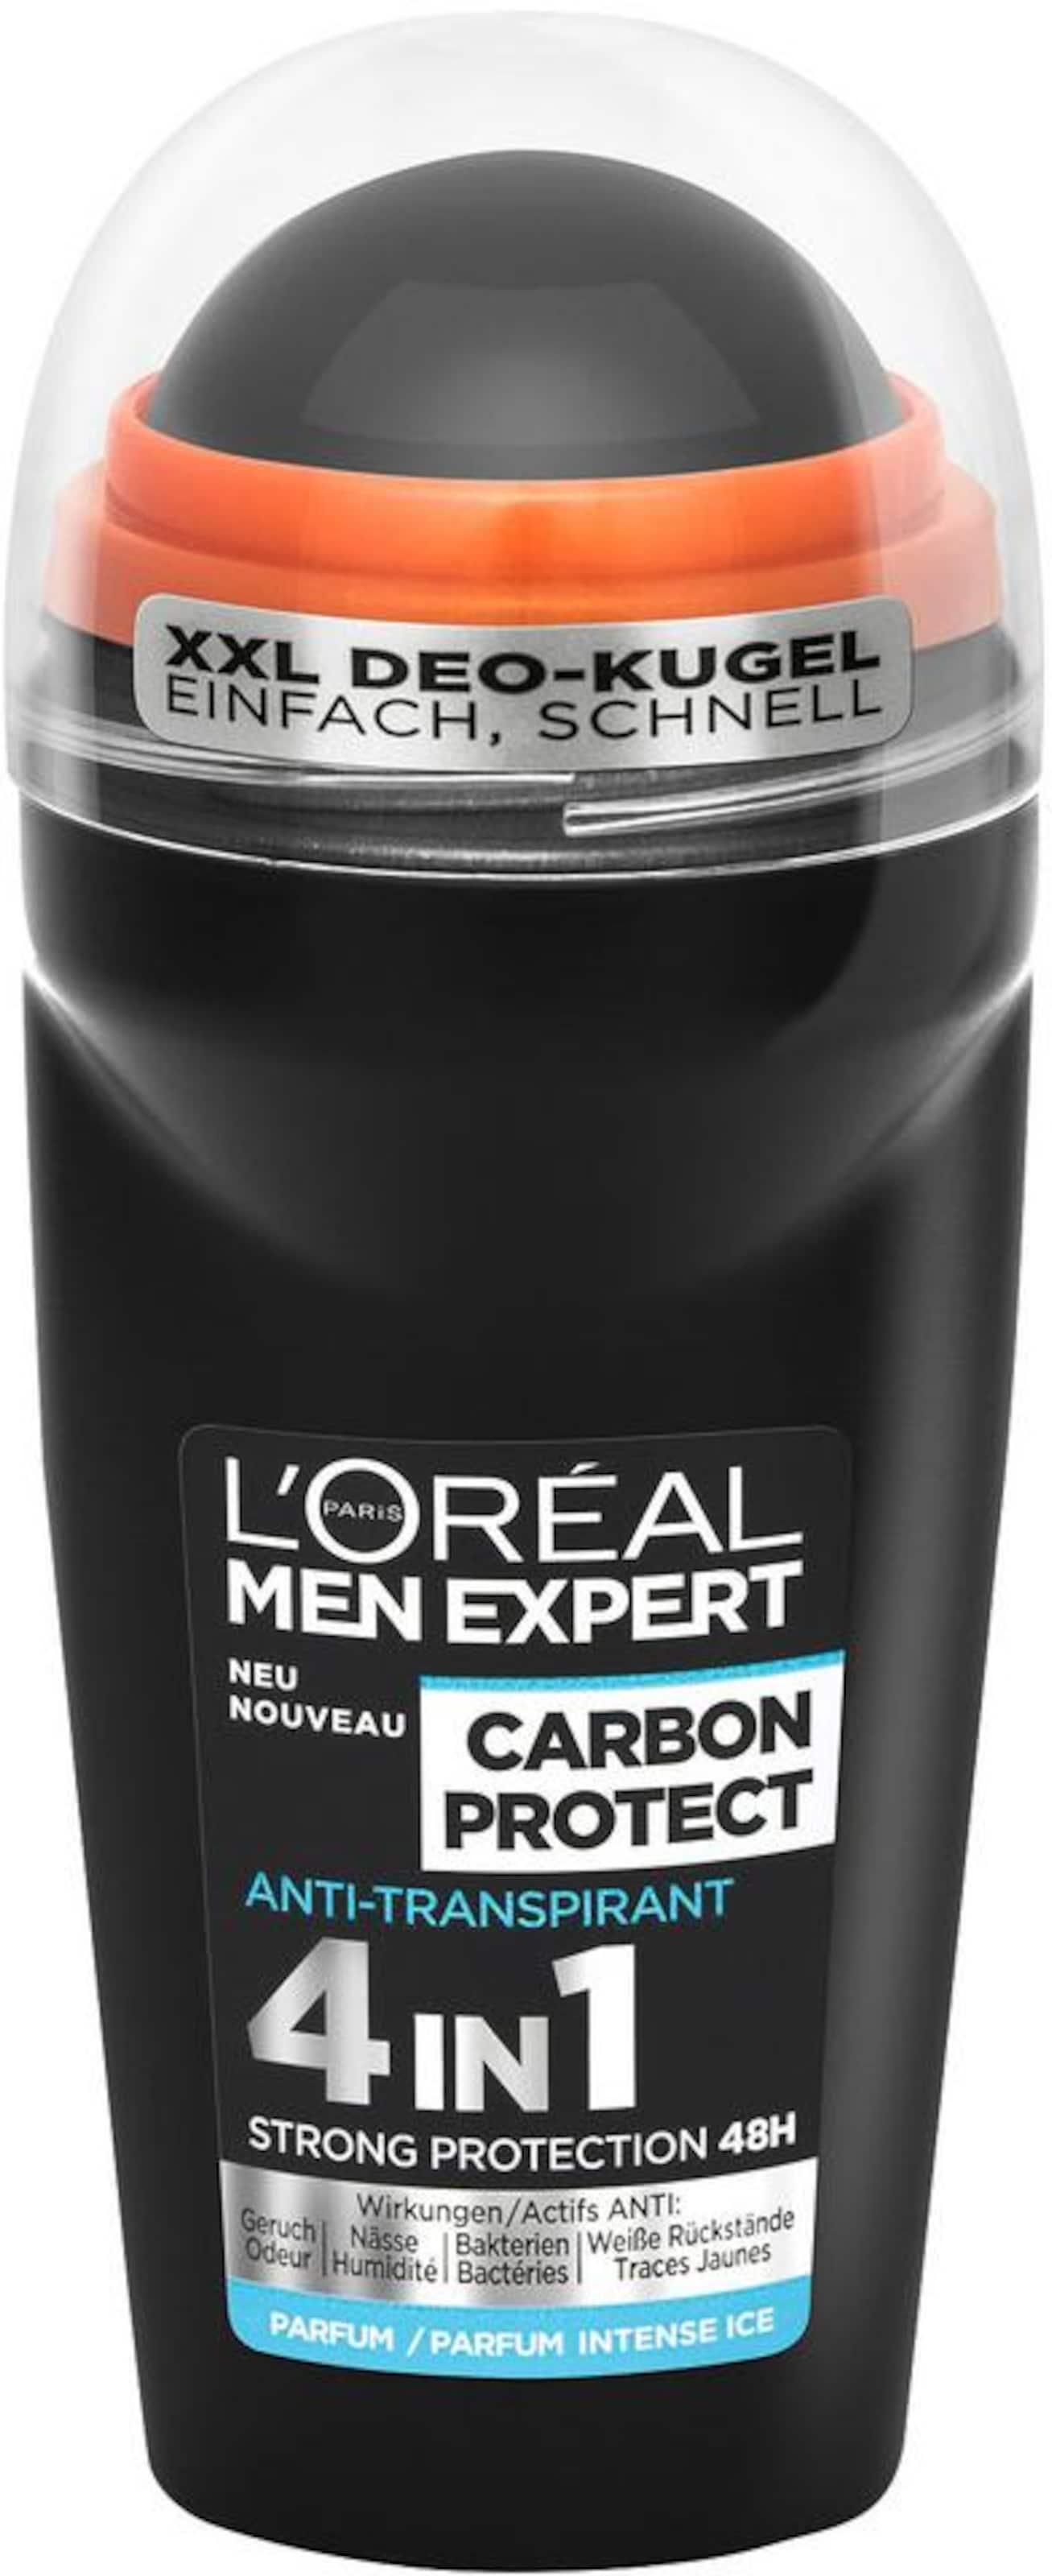 Clean' L'oréal Men Paris Expert In Körperpflege 'carbon set Schwarz Protectamp; cFuT1JK5l3